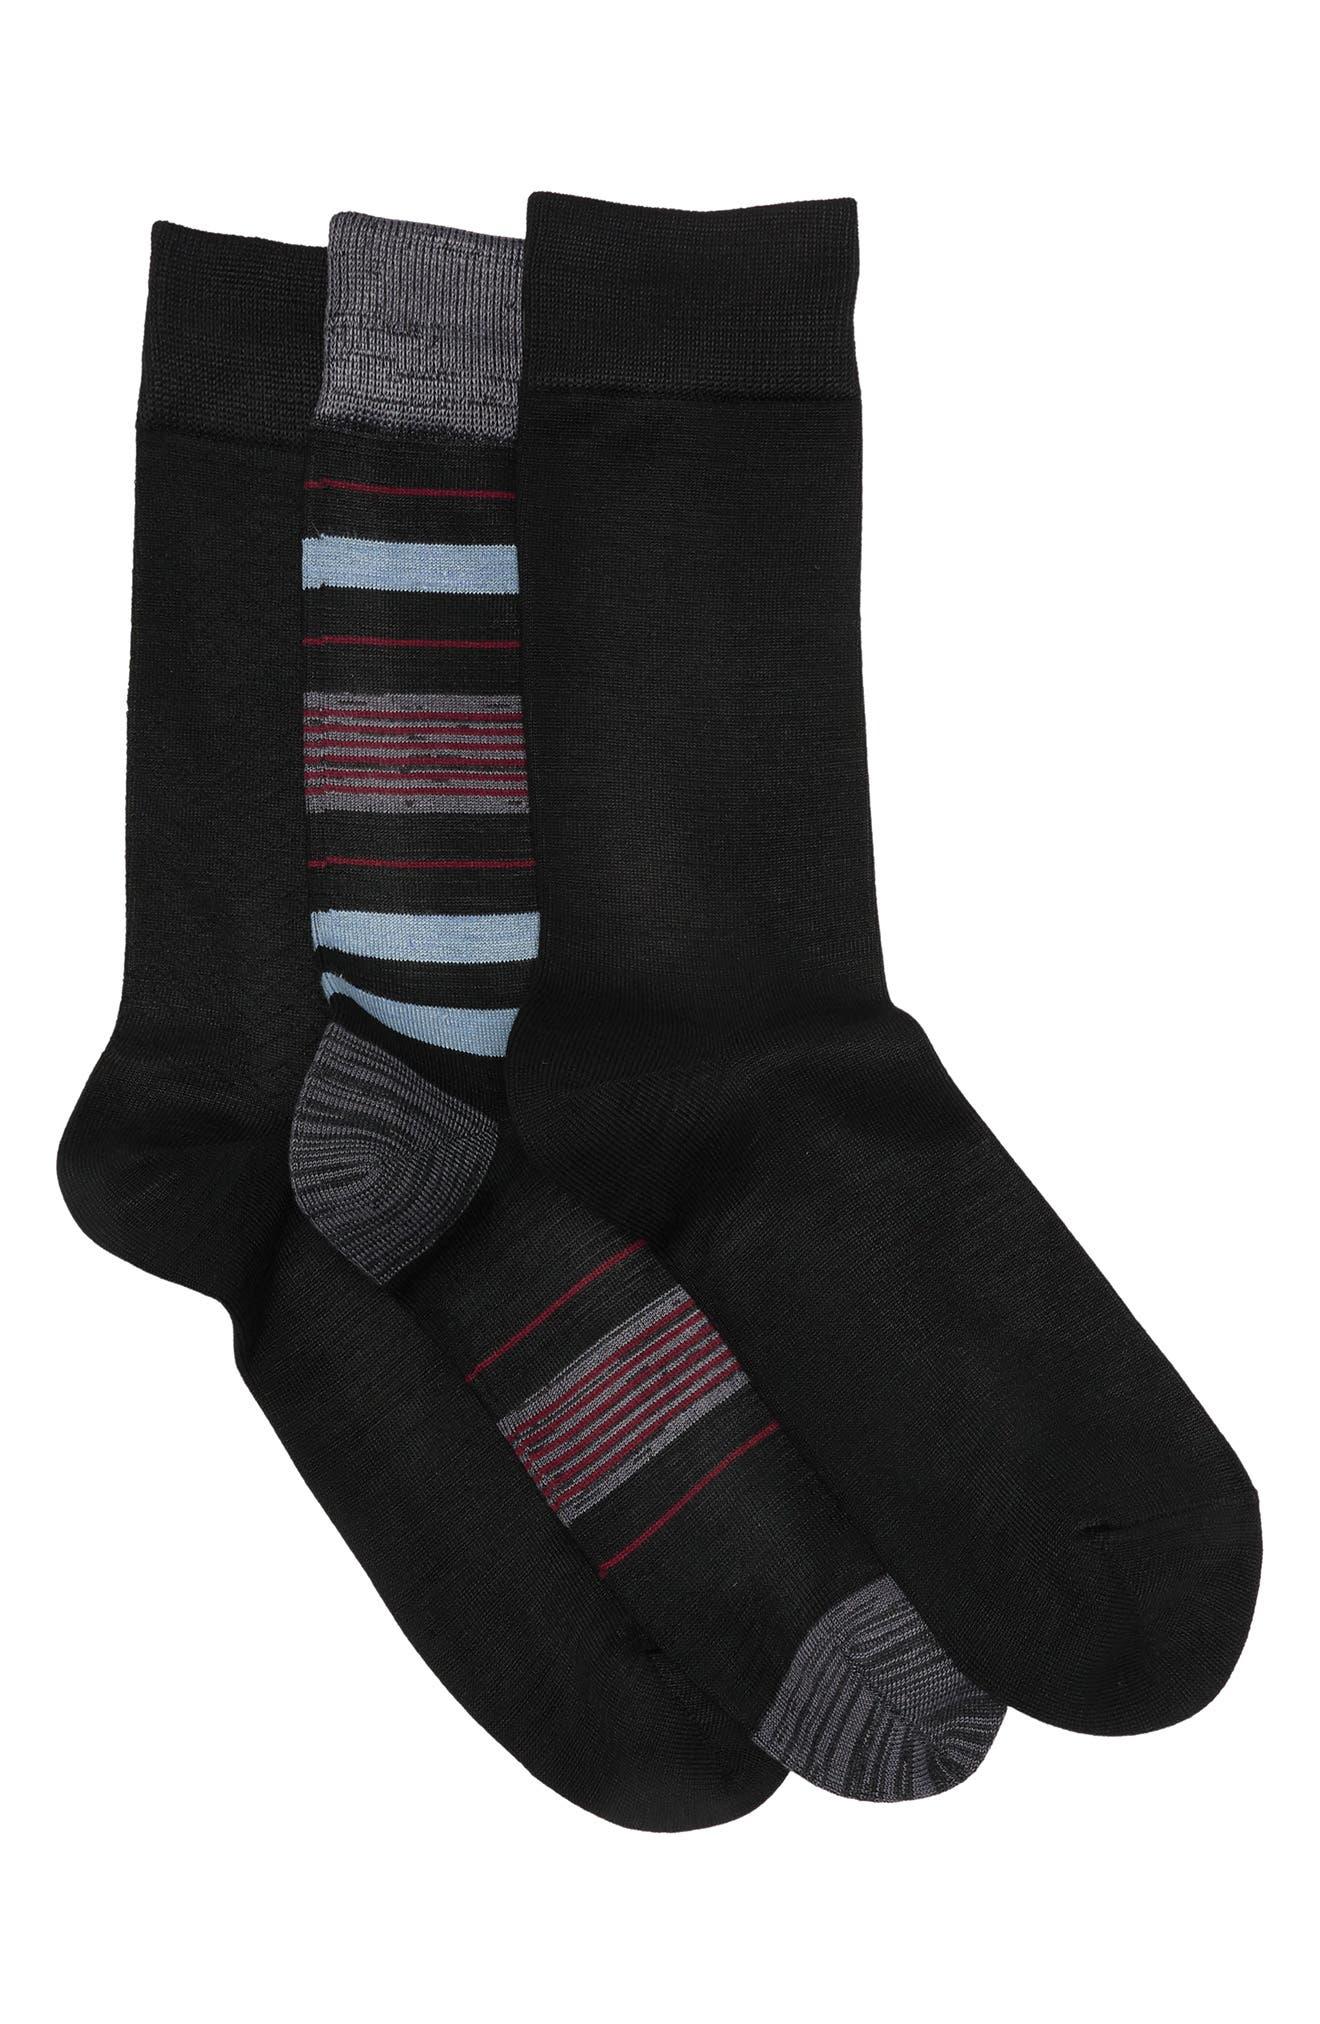 Image of Nordstrom Ultra Soft Crew Socks - Pack of 3